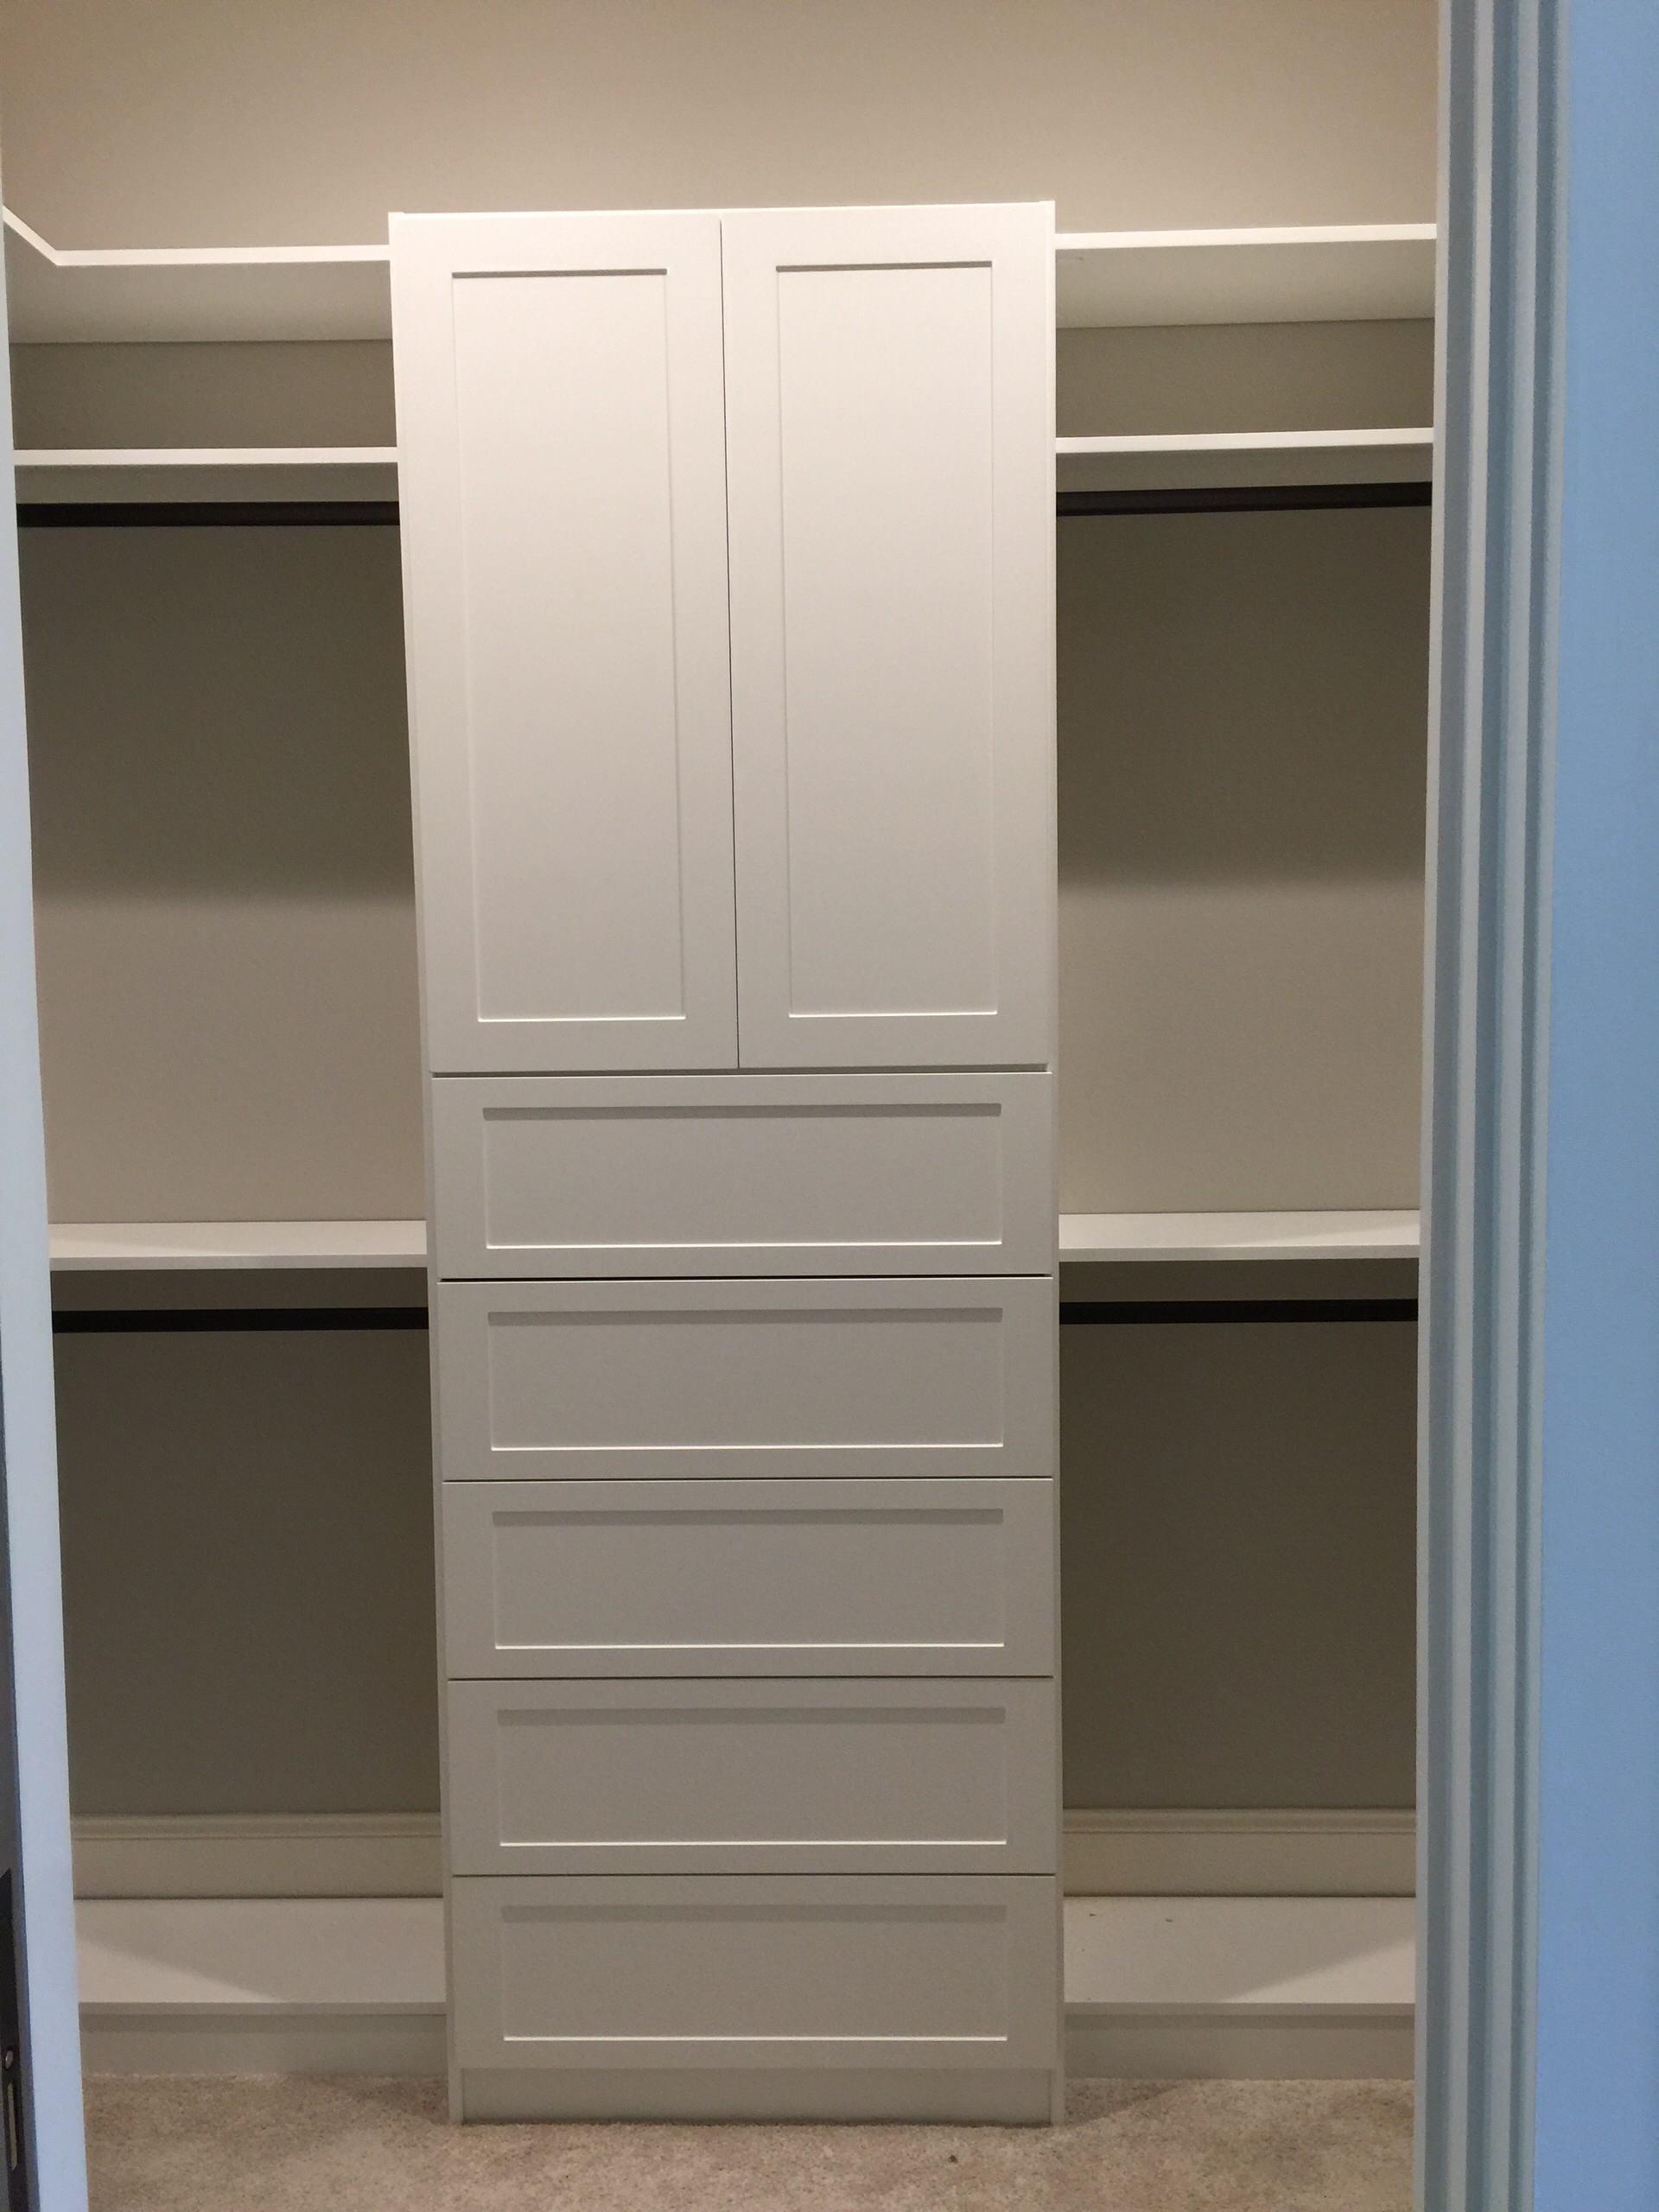 Master Walk-in Closet in Highlands, NC